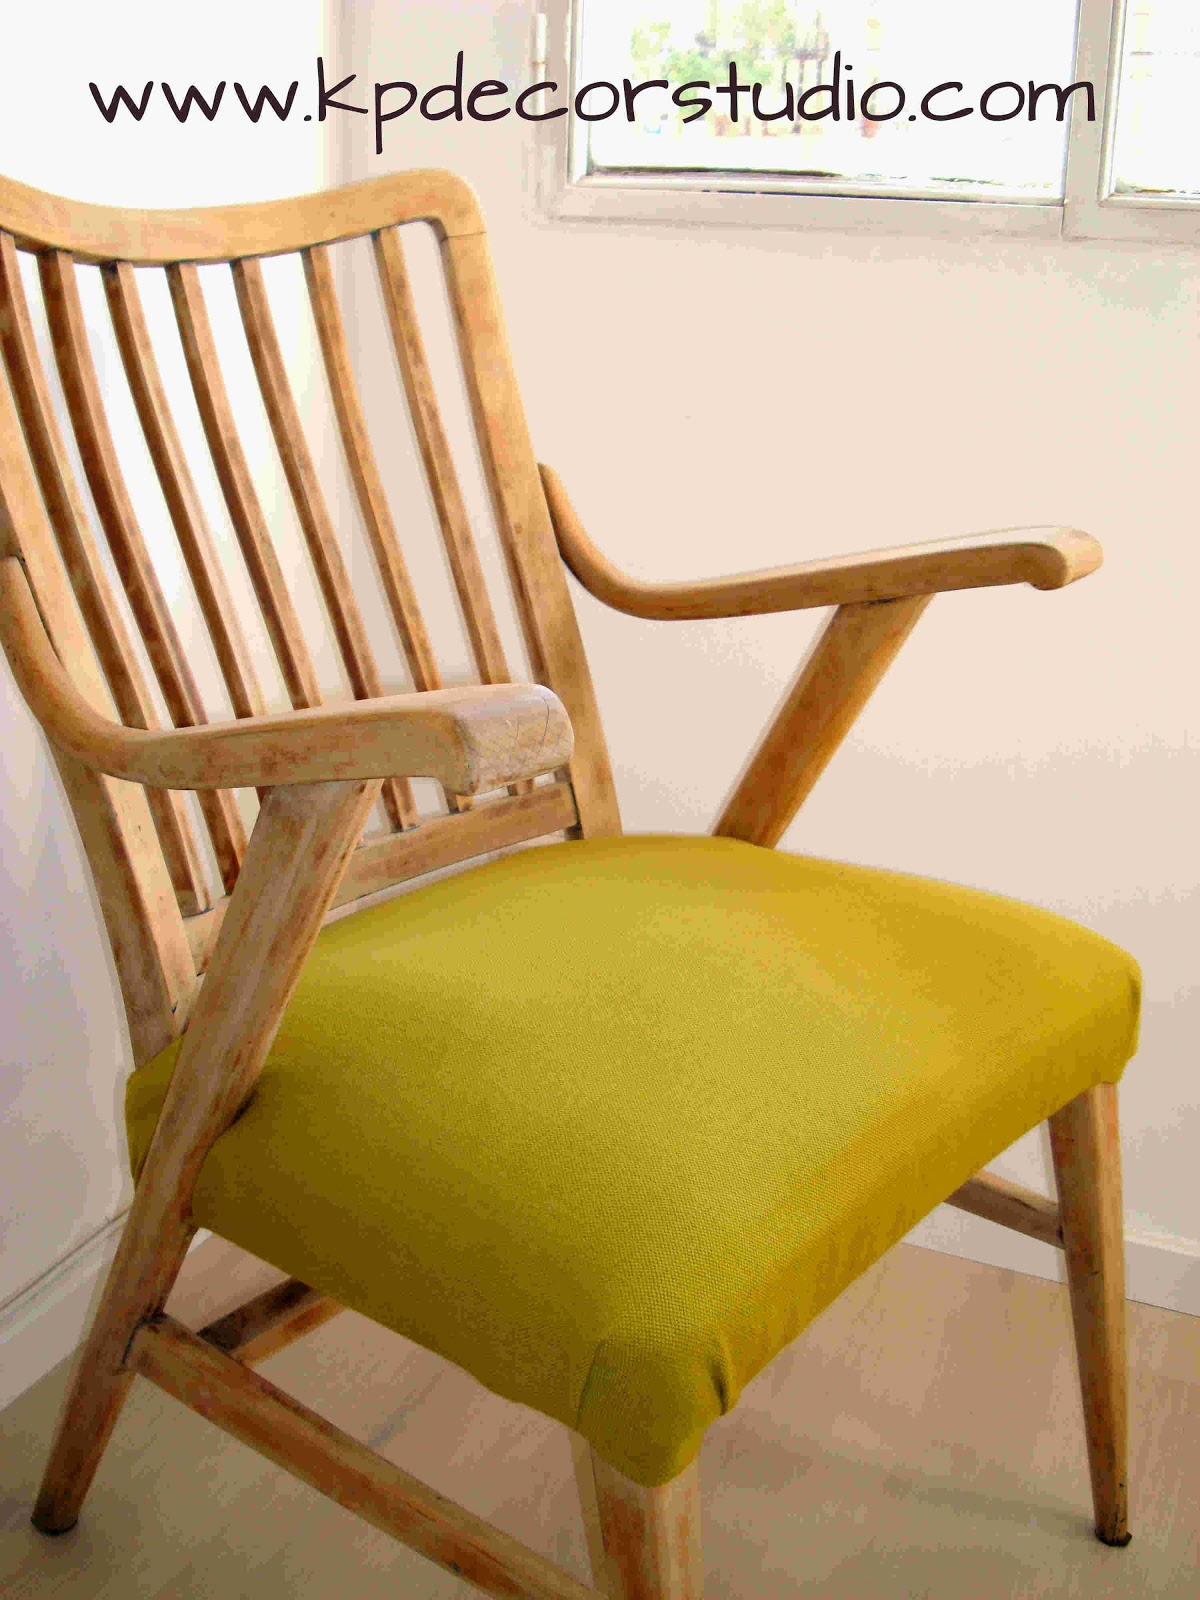 Kp decor studio ayd butaca en madera de haya baa a beechwood chair - Como restaurar sillas de madera ...